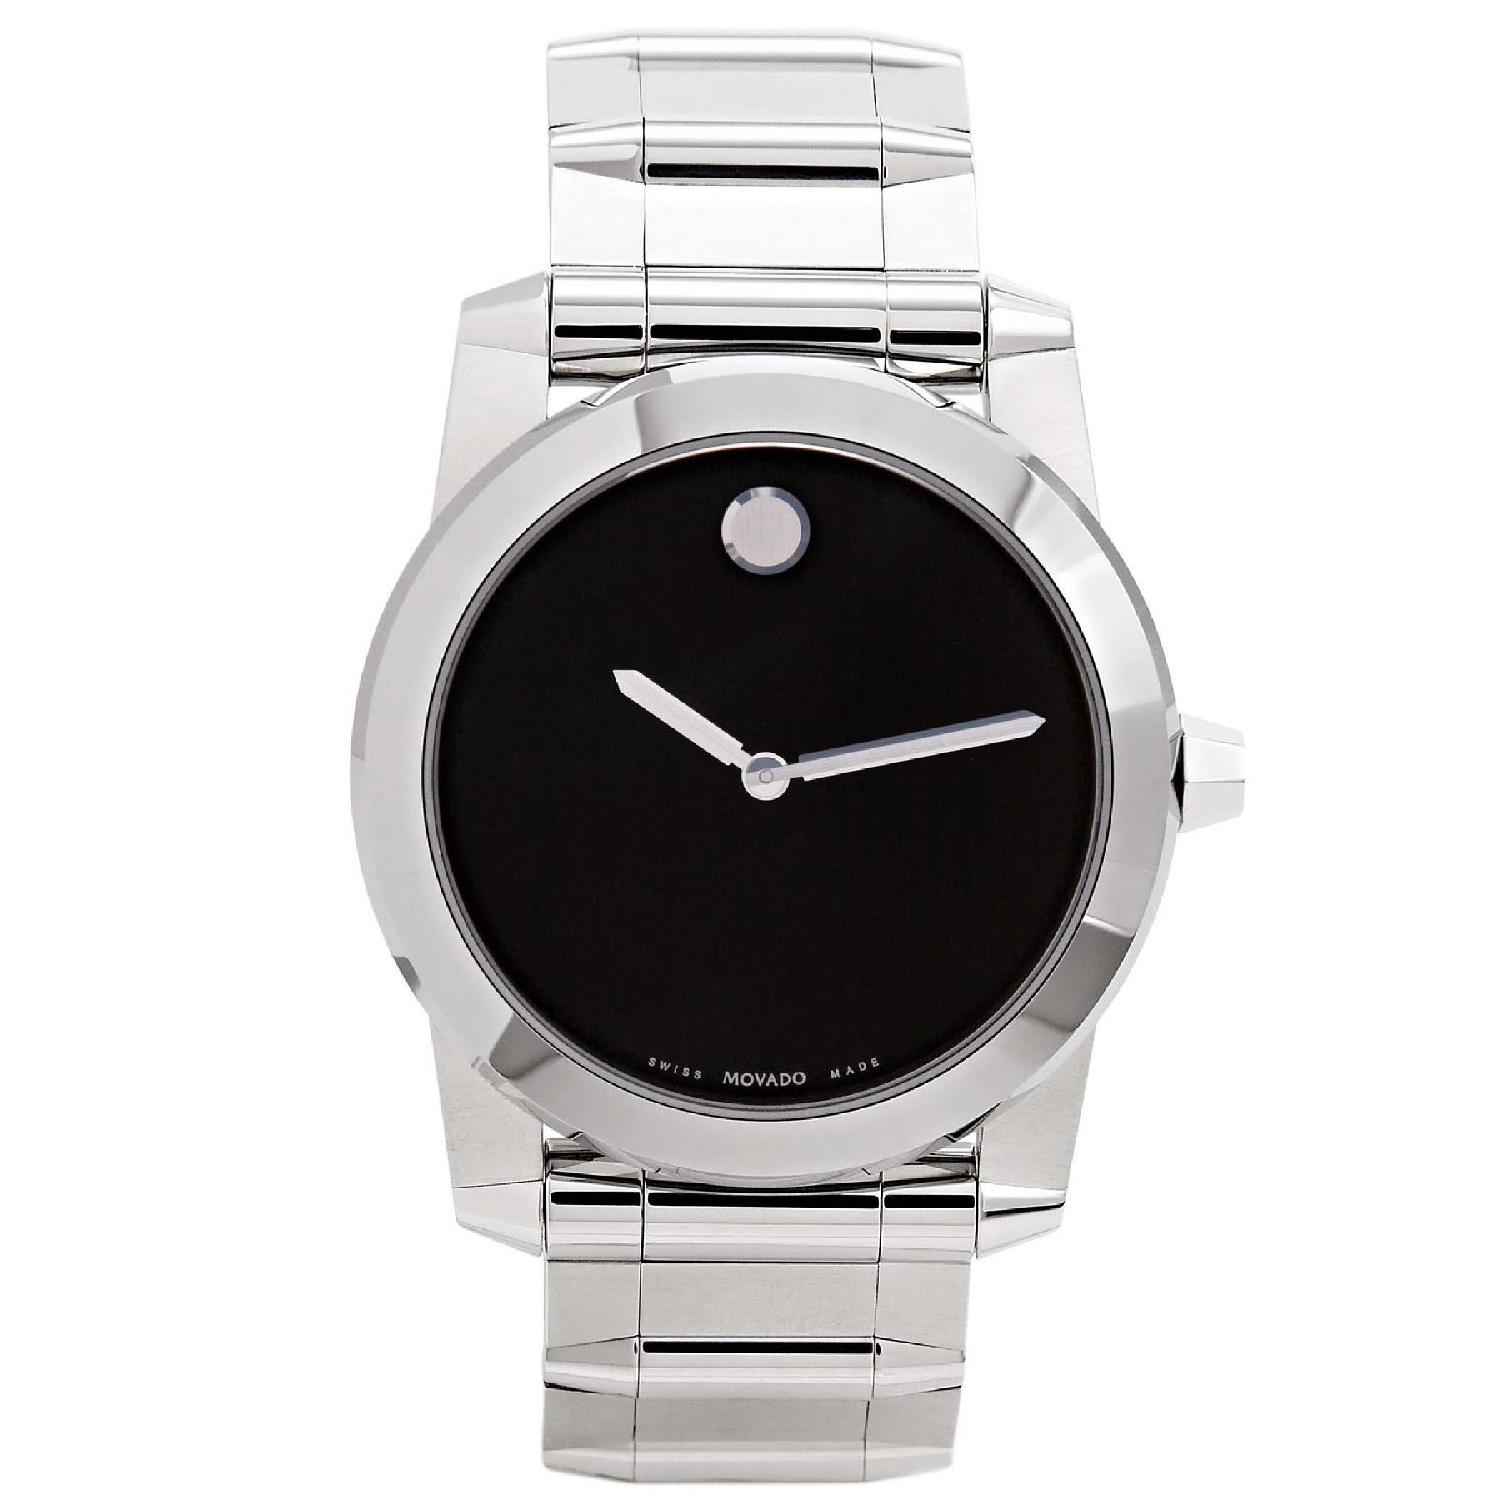 Movado Men s Vizio Quartz Watch 605808